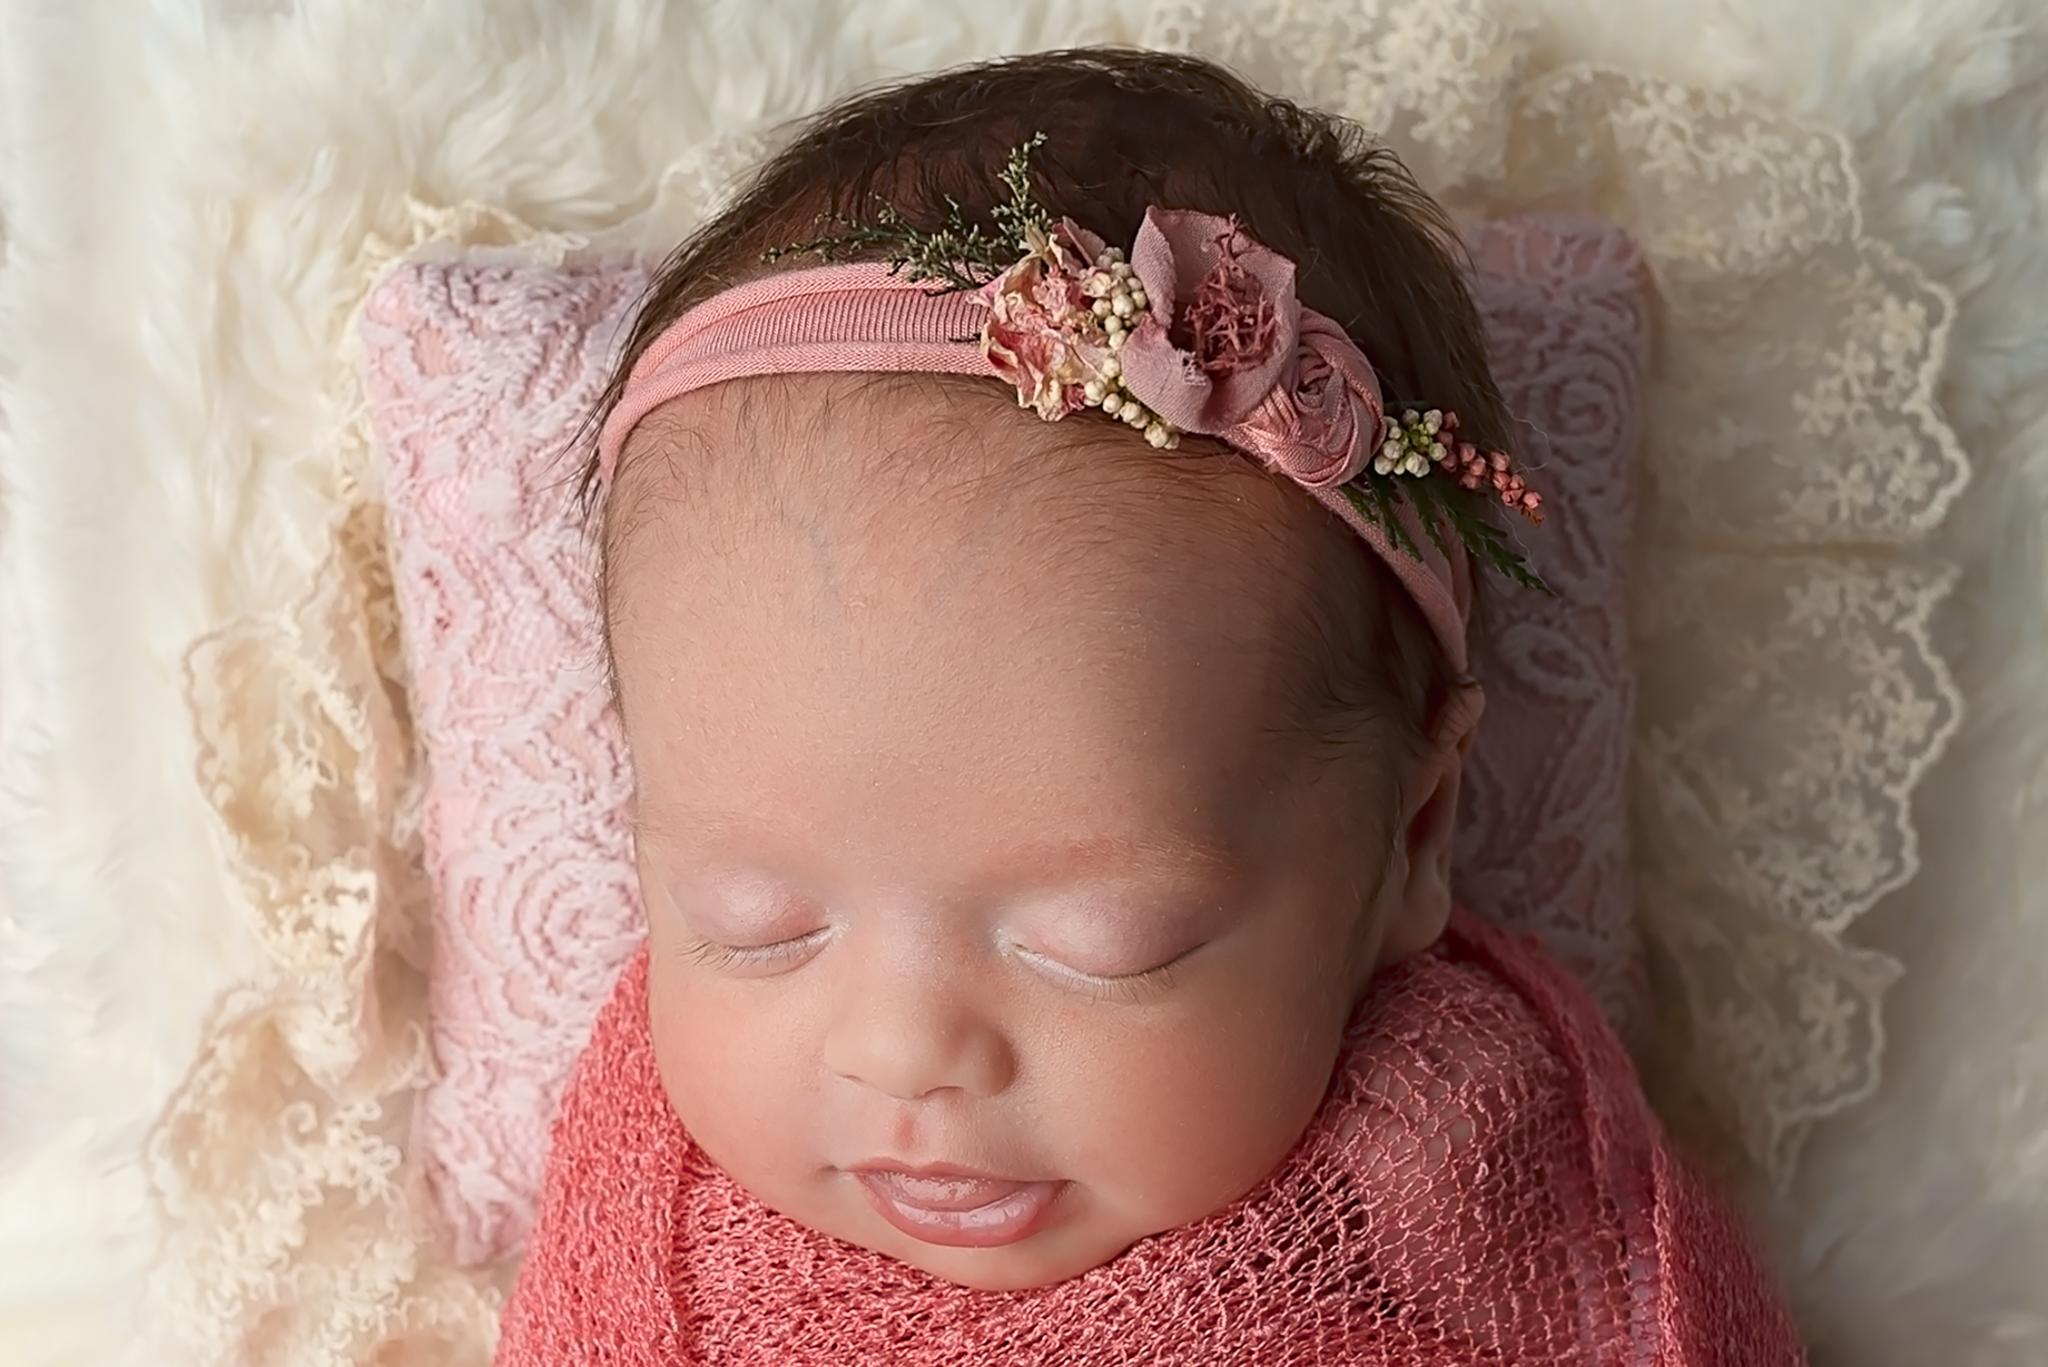 Professional newborn photography Leeds-York-Bradford-Harrogate-Wakefield: newborn baby girl sleeping in a bed during her newborn photoshoot in Leeds, Yorkshire